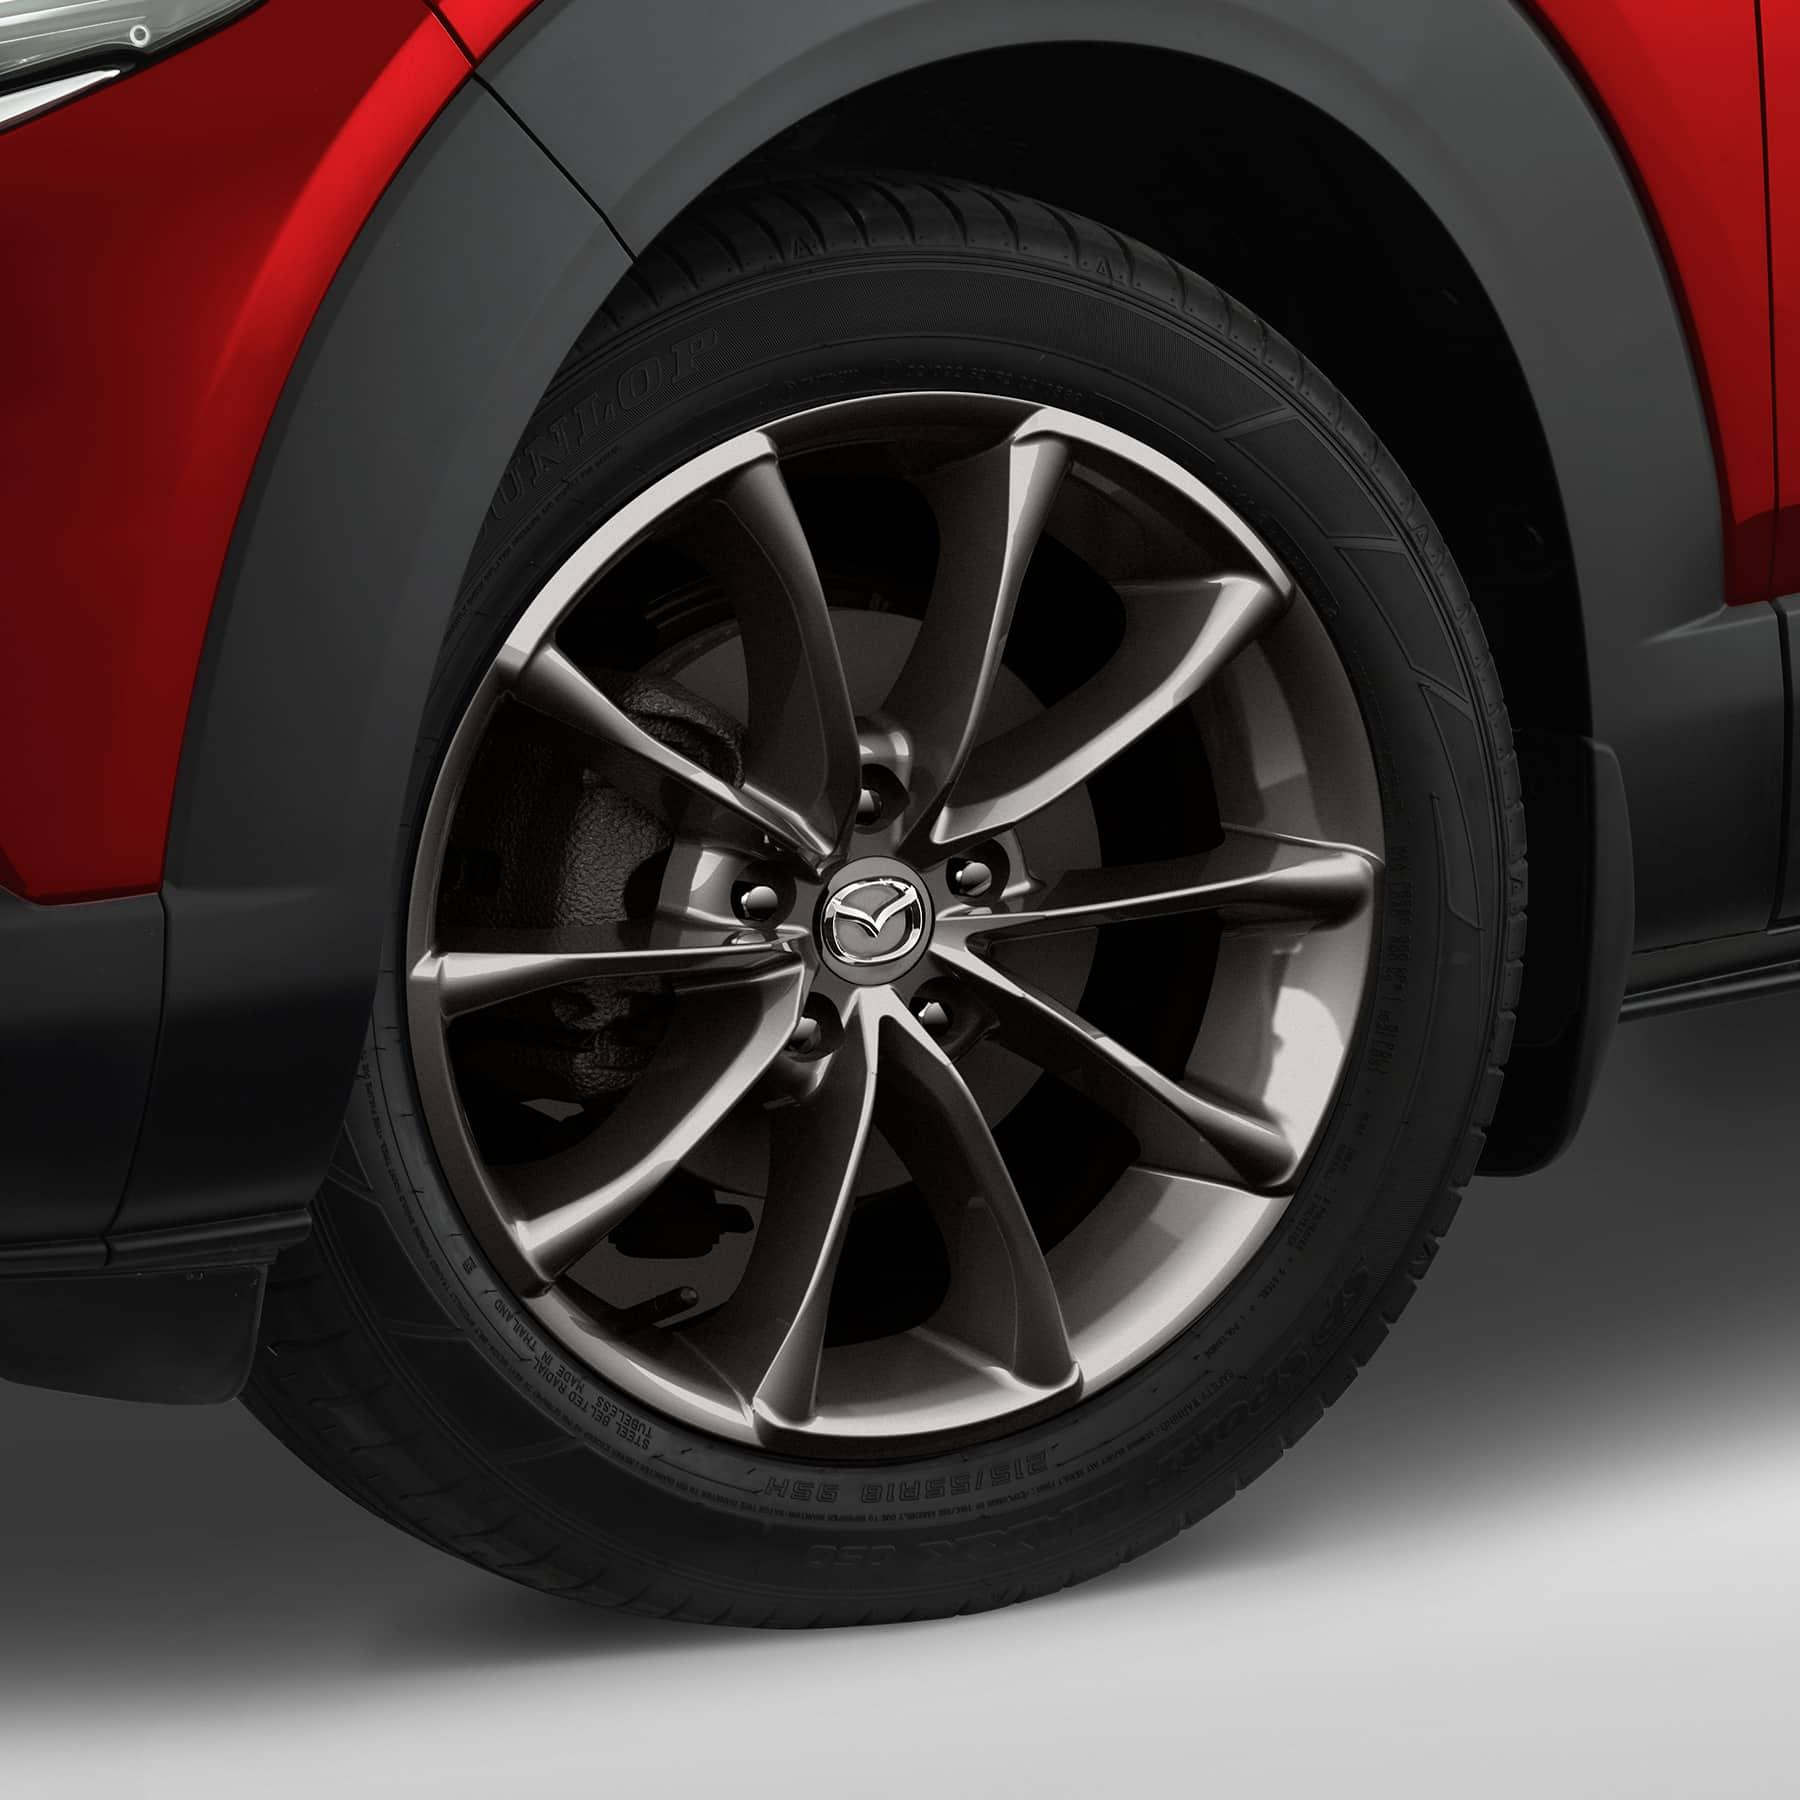 18- Inch Satin Chrome Alloy Wheels